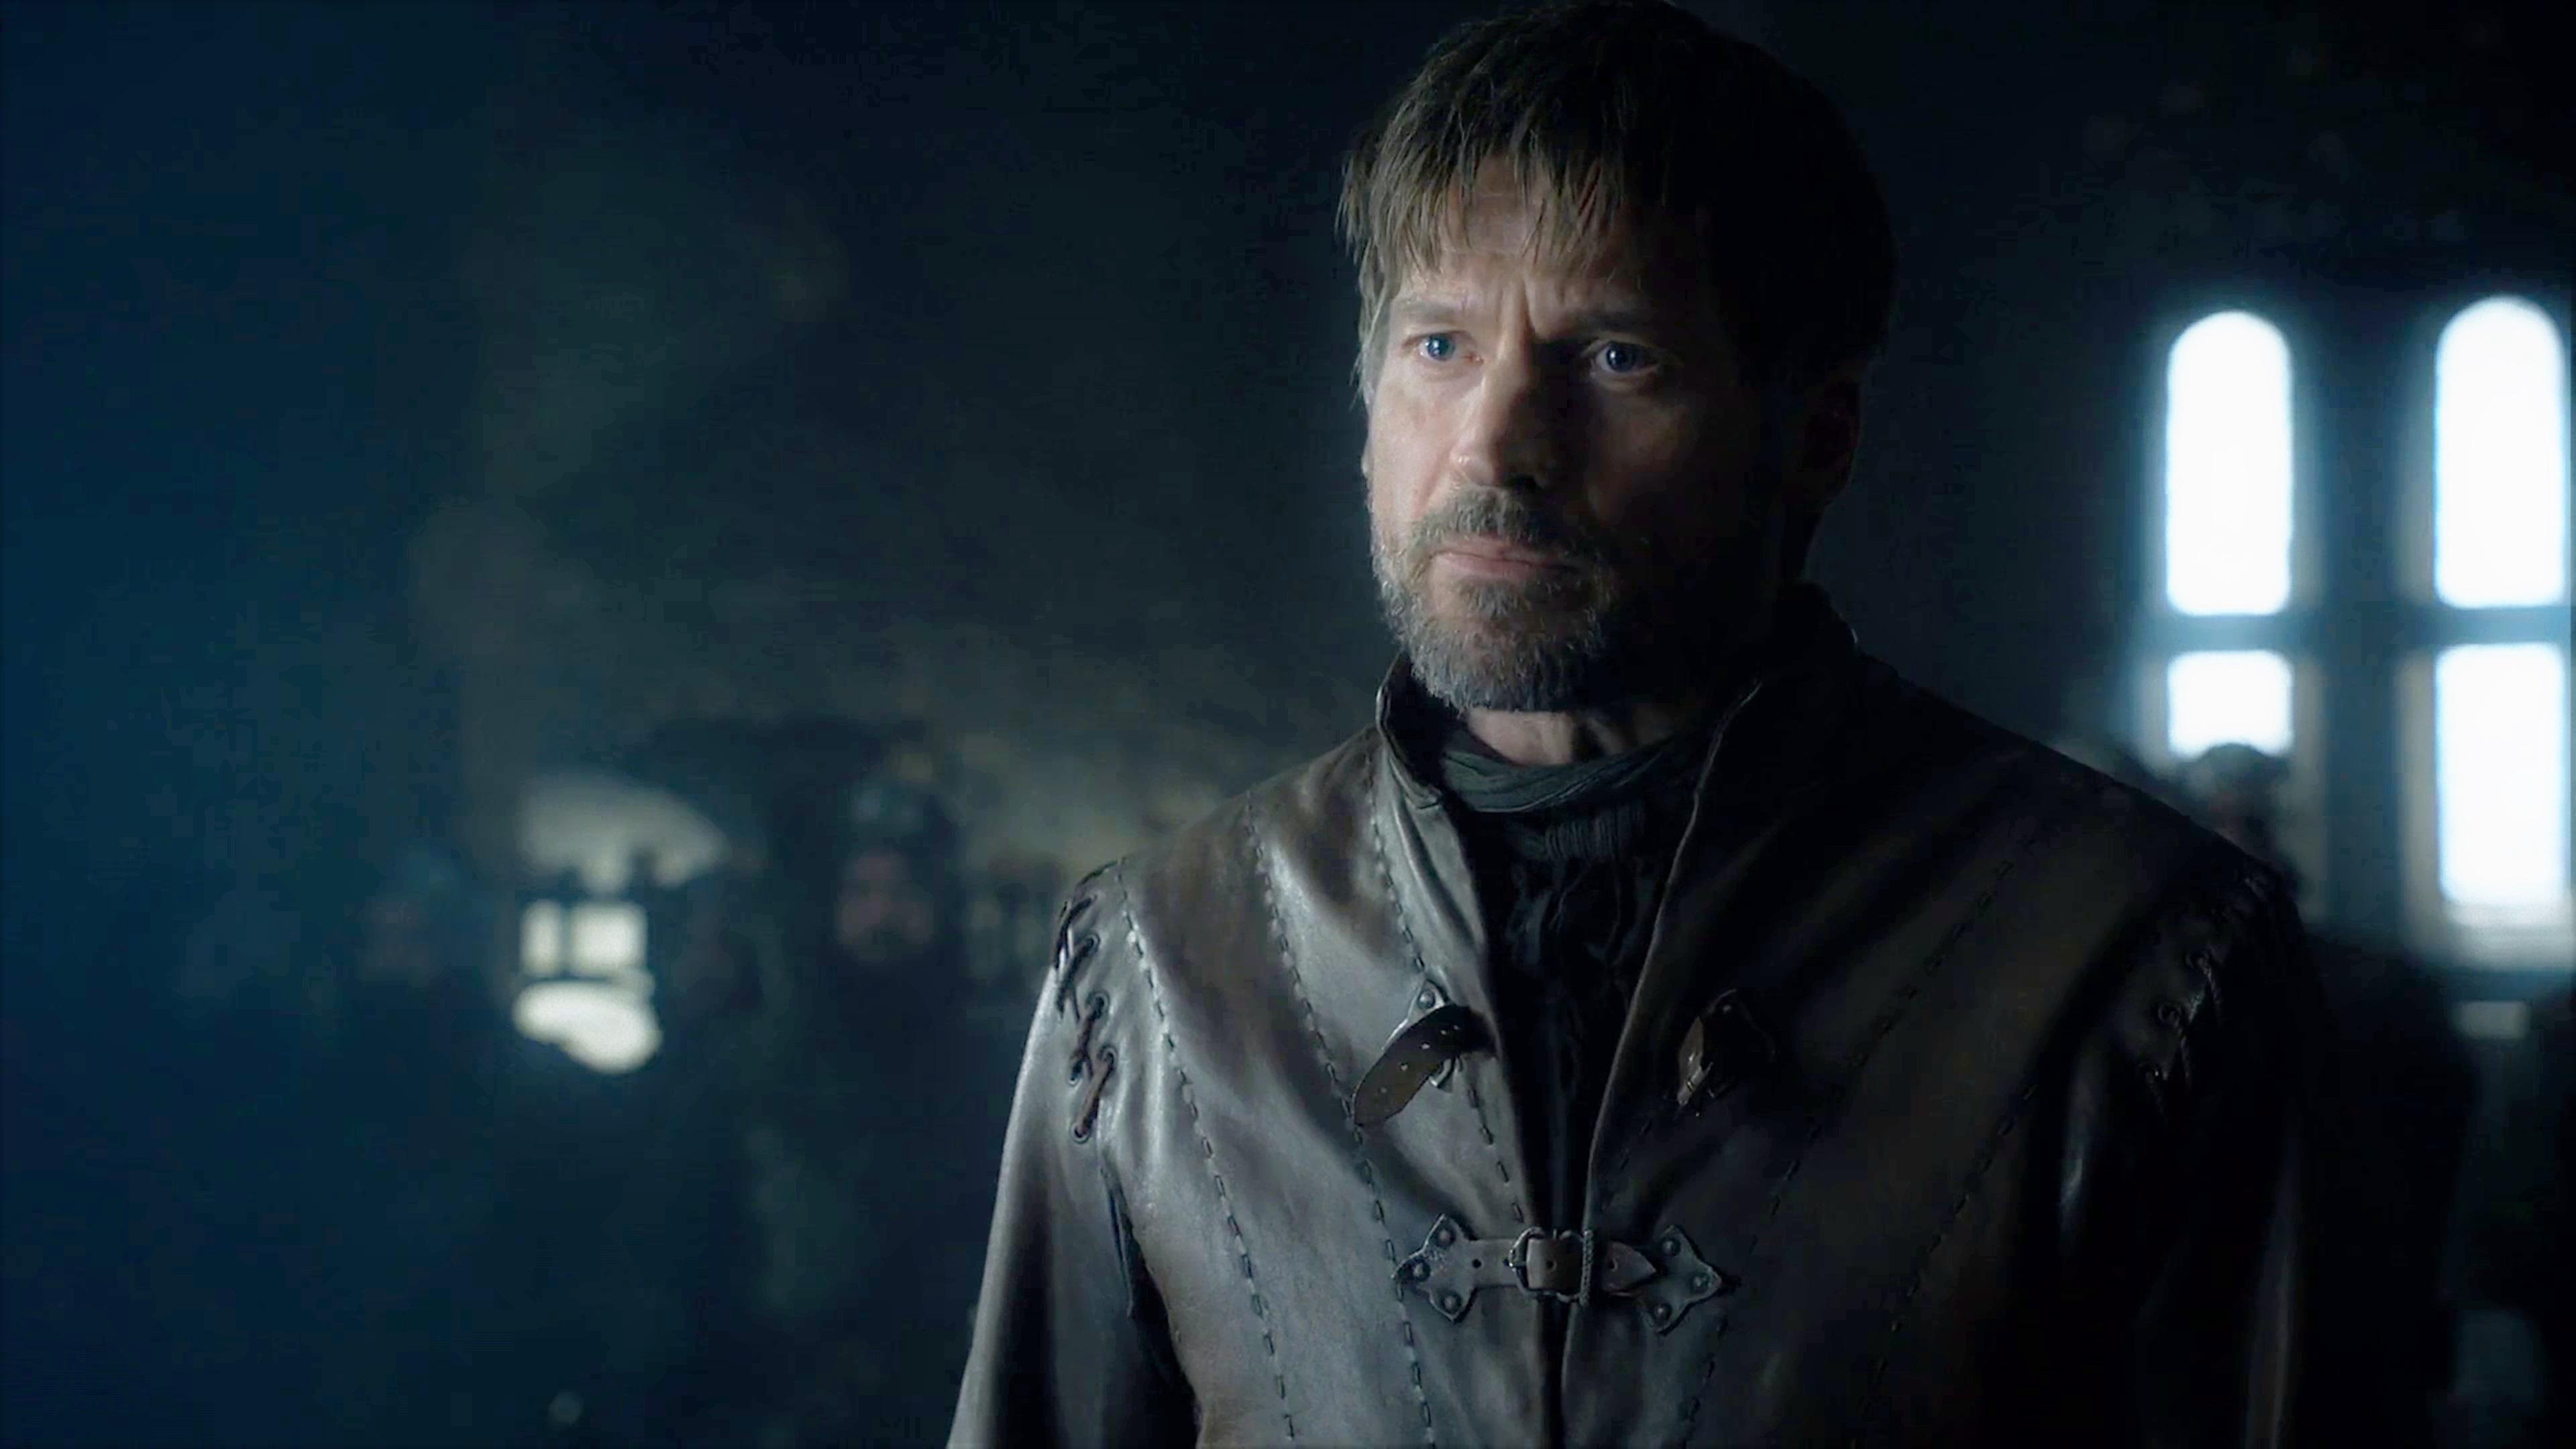 33. Season 8 Trailer Jaime Lannister Winterfell